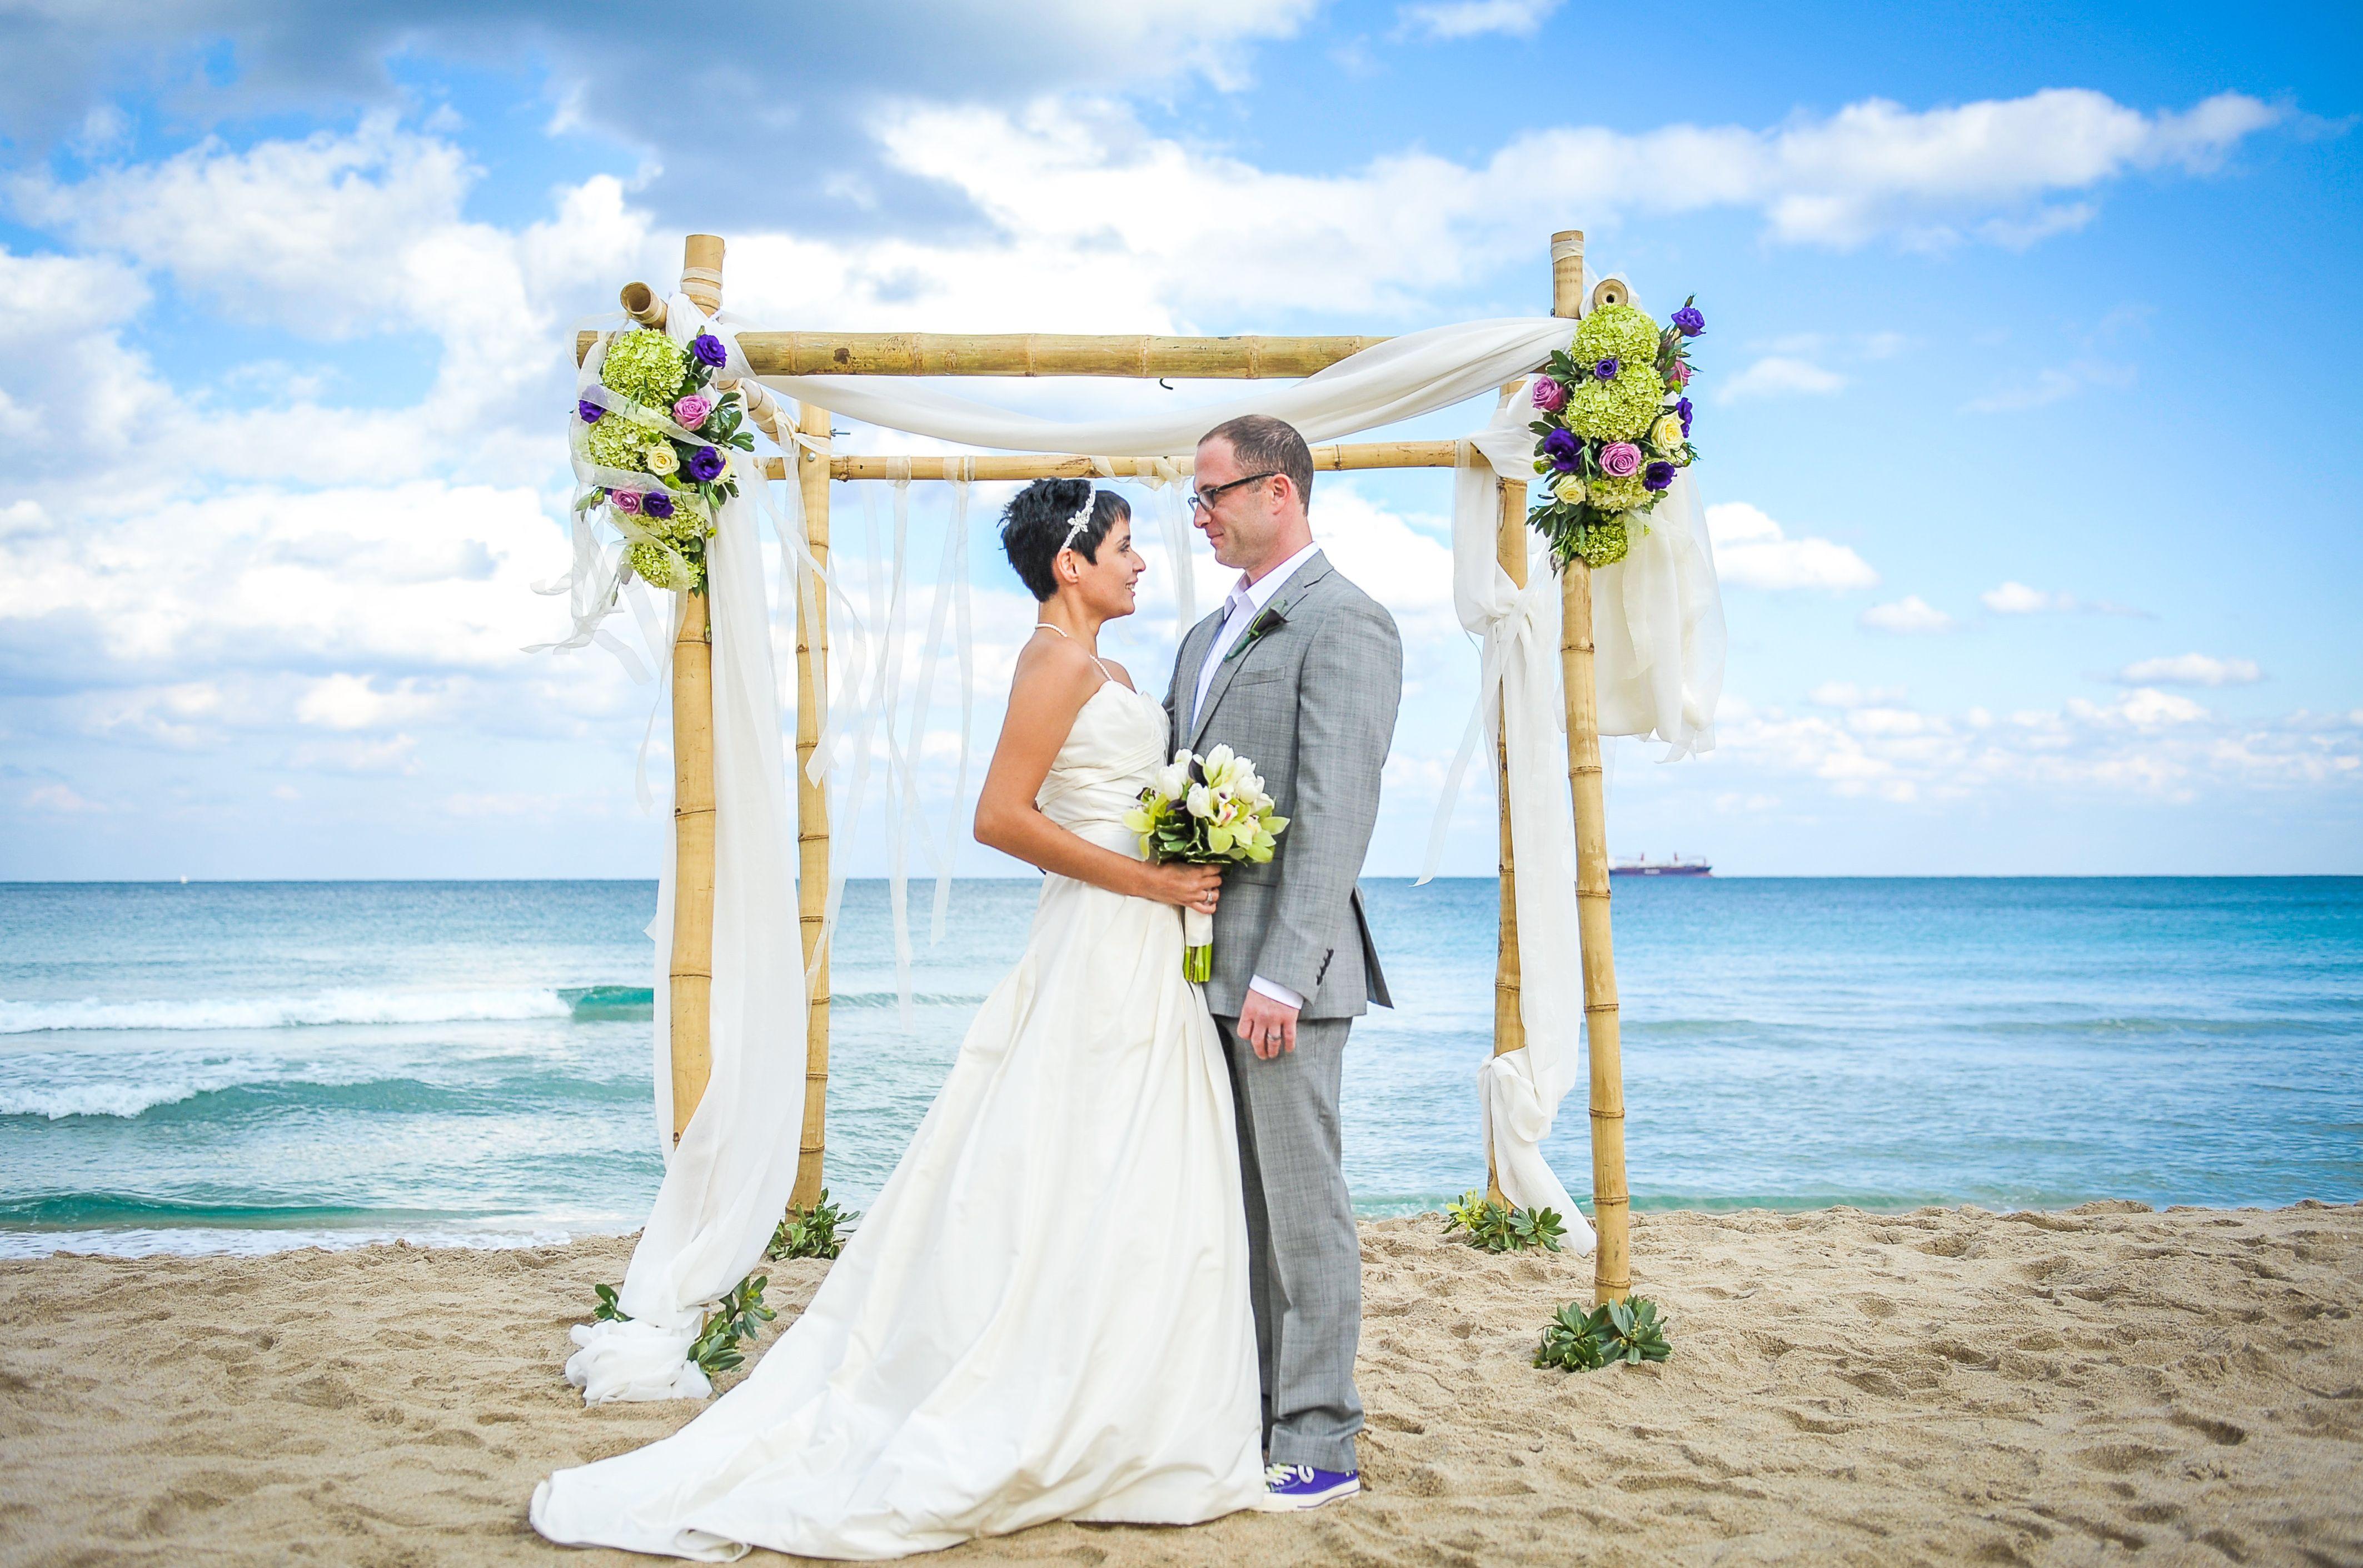 Wedding alter at a beach wedding.